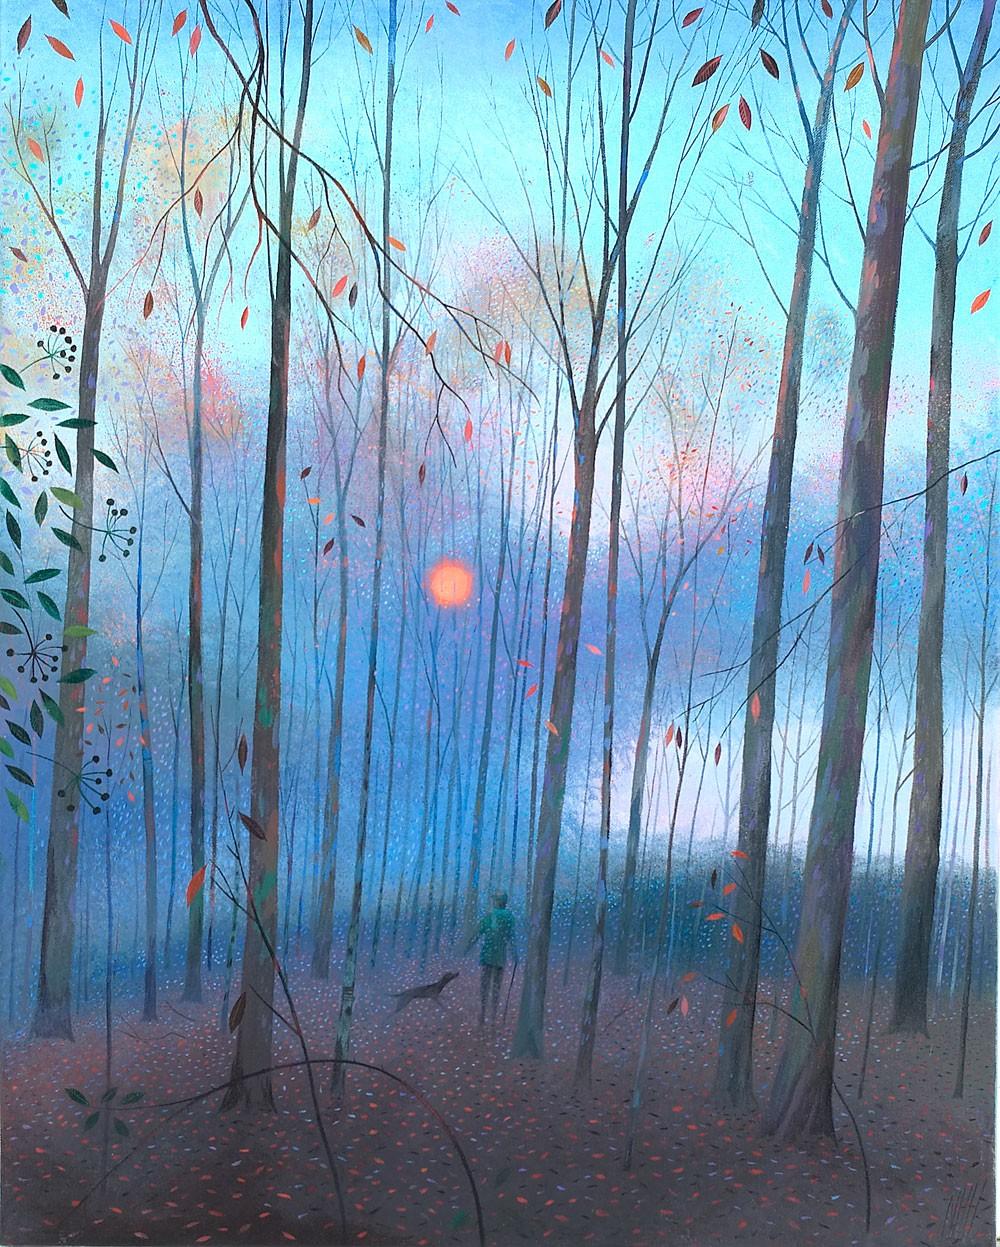 Deep in the Woods – Winter Sun